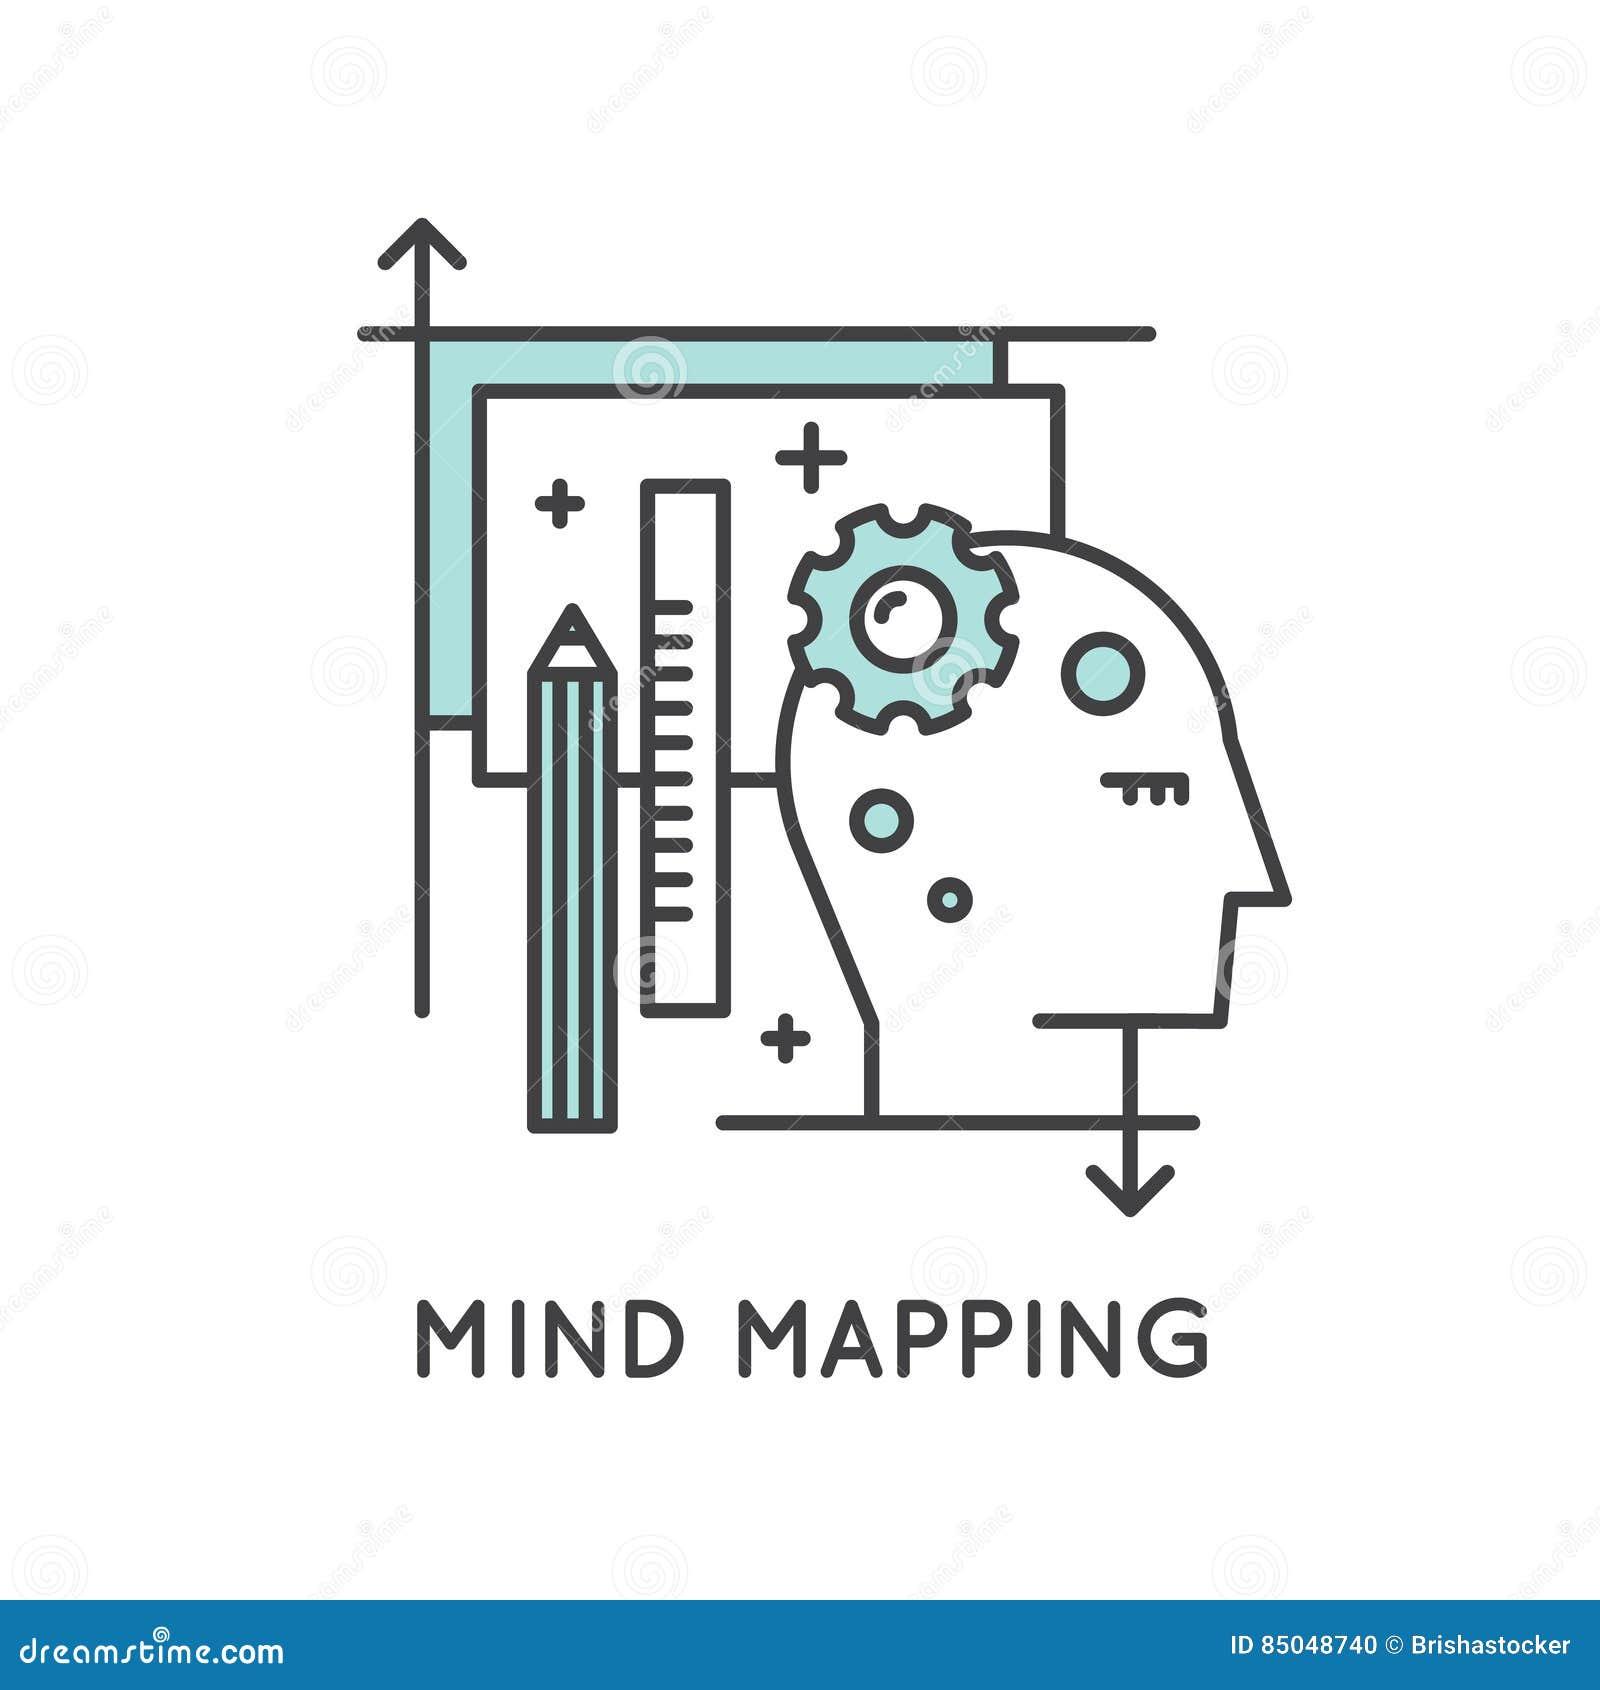 Imagination Smart Solution Creativity Brainstorm And Mind Map